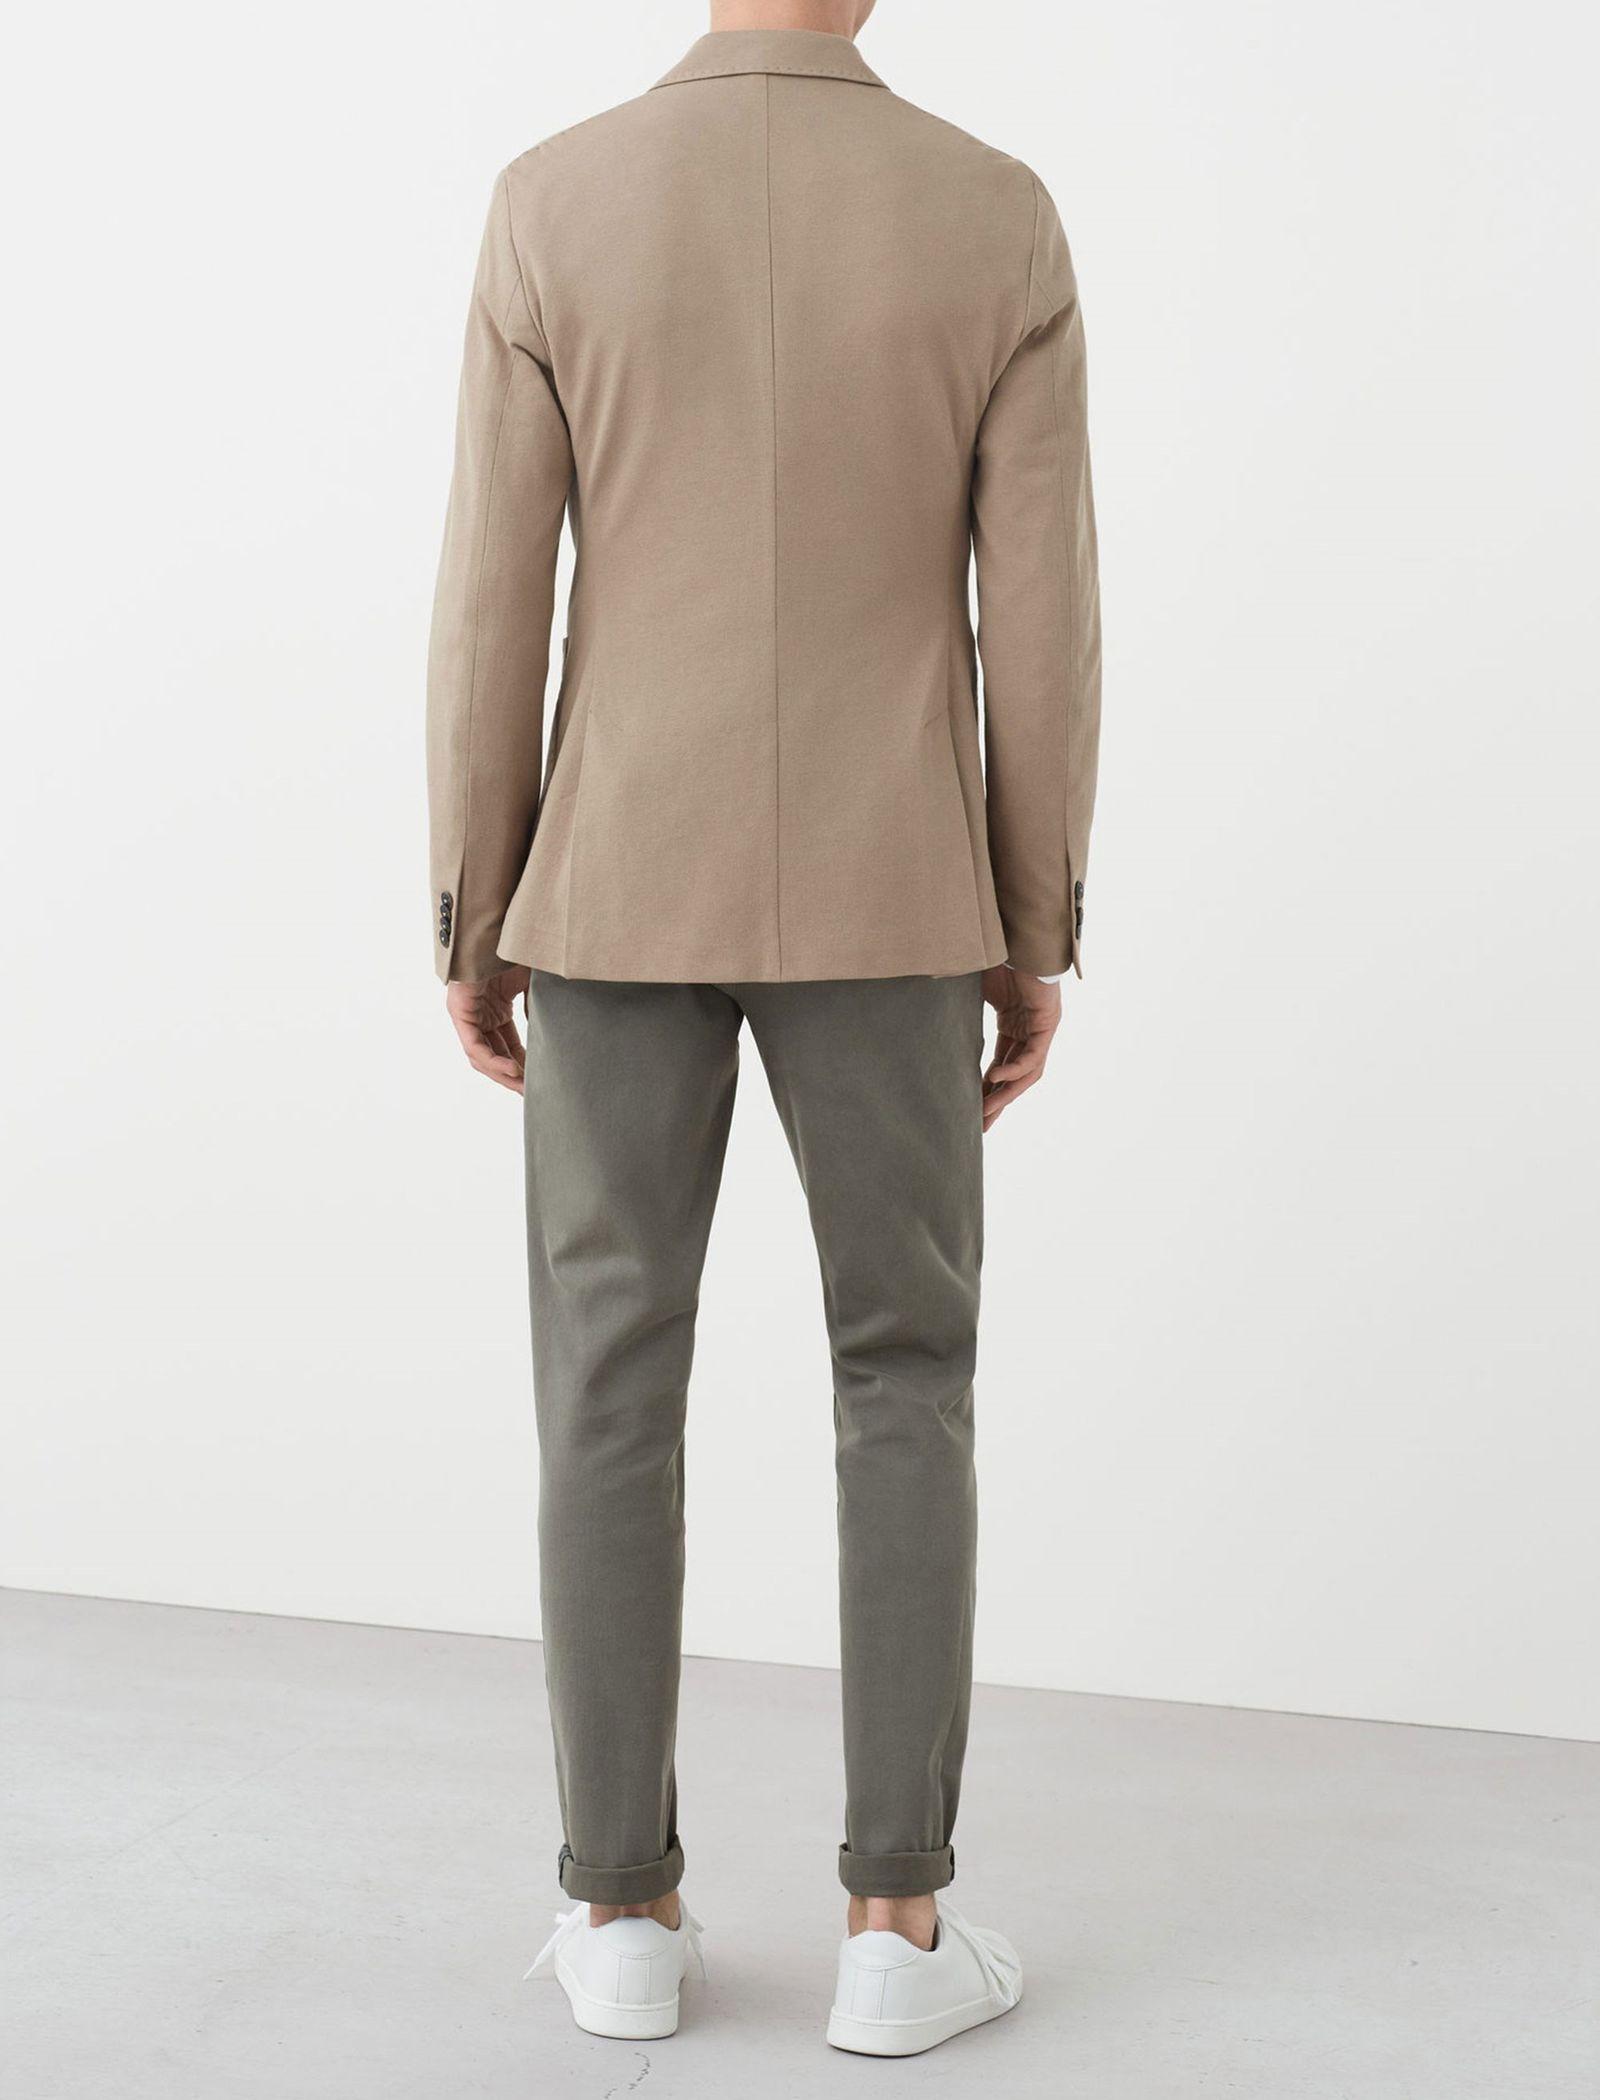 کت تک نخی مردانه - مانگو - بژ روشن - 3